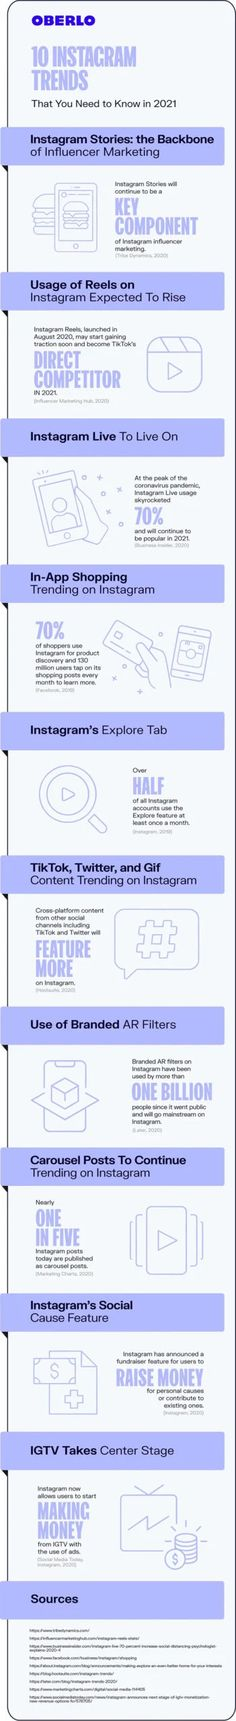 Instagram: Diese 10 Trends erwarten dich 2021   OnlineMarketing.de Key Instagram, Find Instagram, Facebook Instagram, Social Media Trends, Social Media Content, Marketing Approach, Media Marketing, Digital Marketing, Marketing Strategies